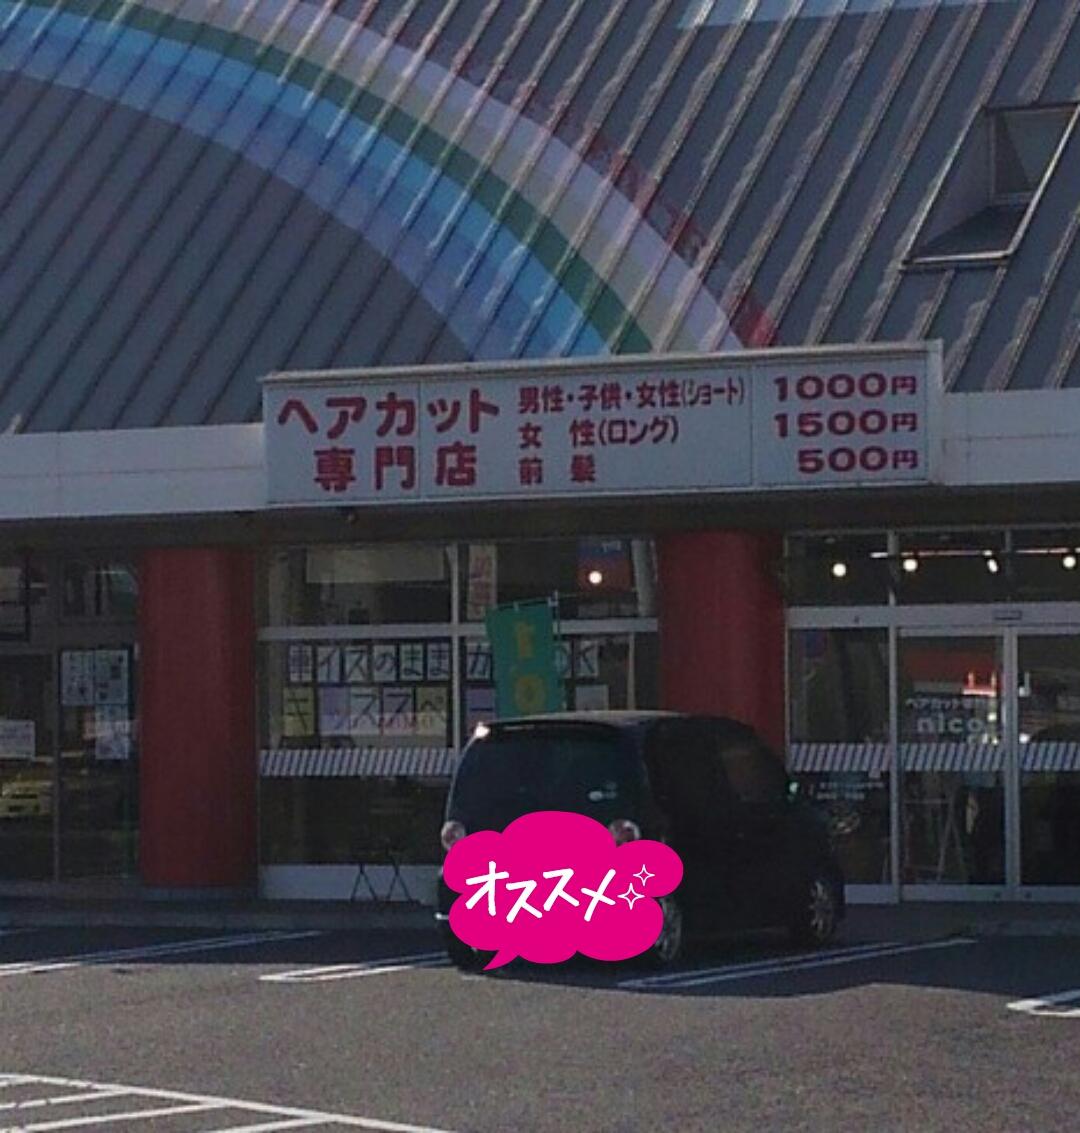 2016-0520-165209963-DI.jpg